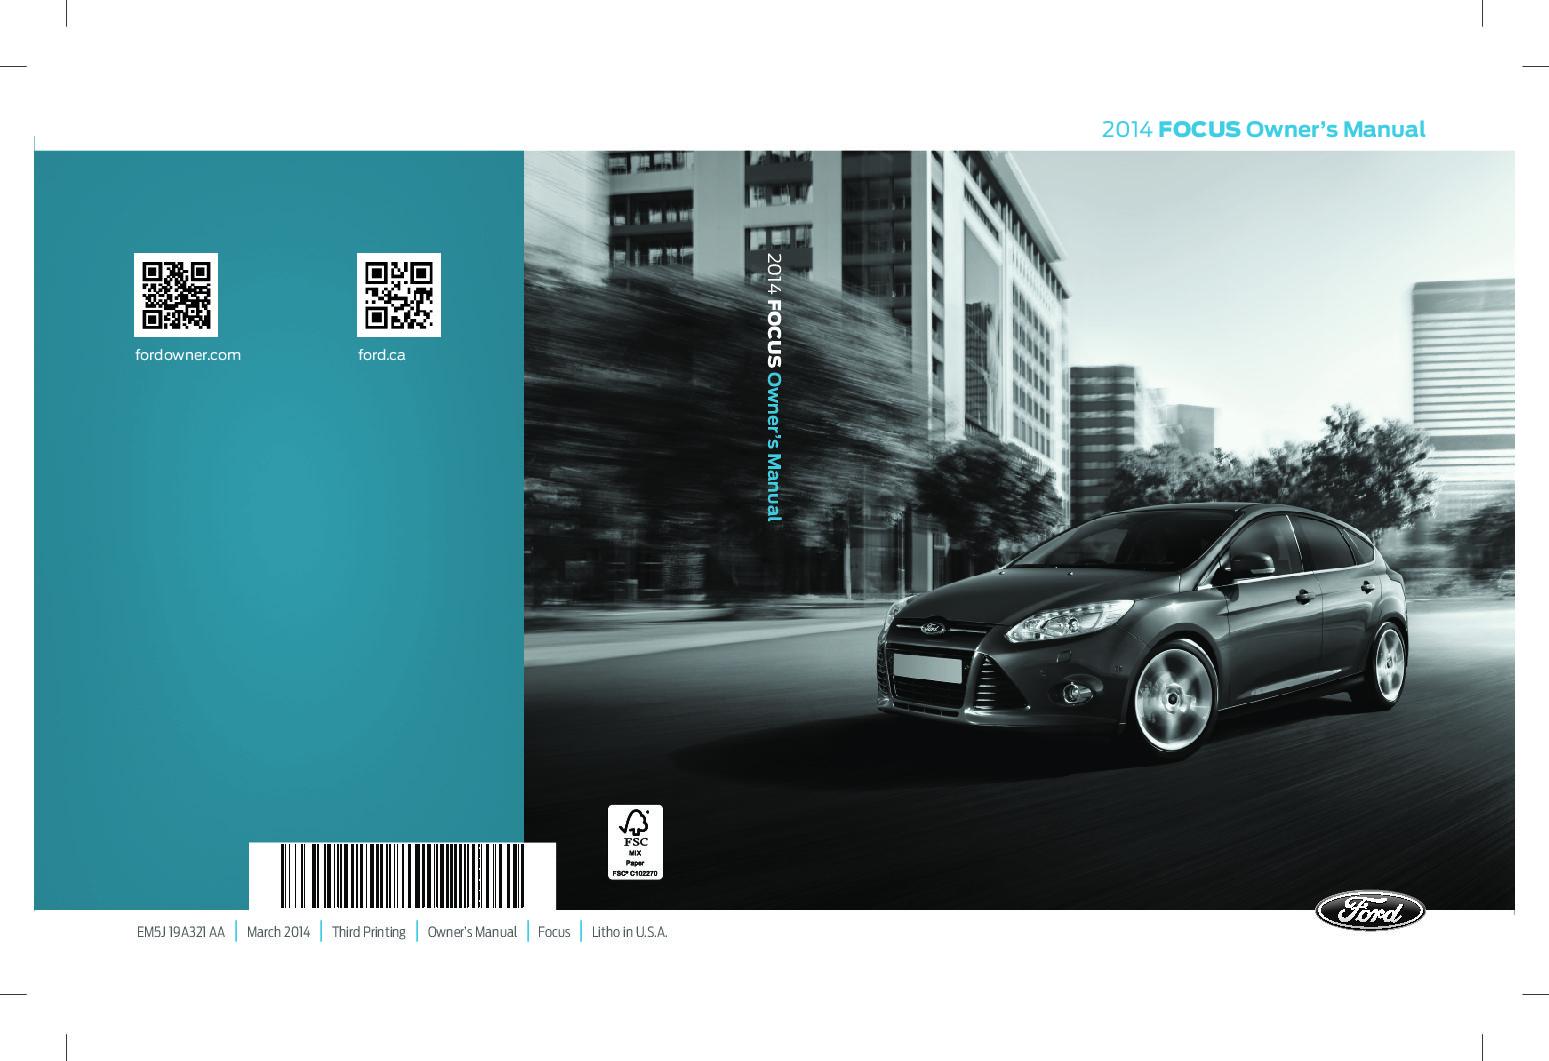 Download ford focus user manual